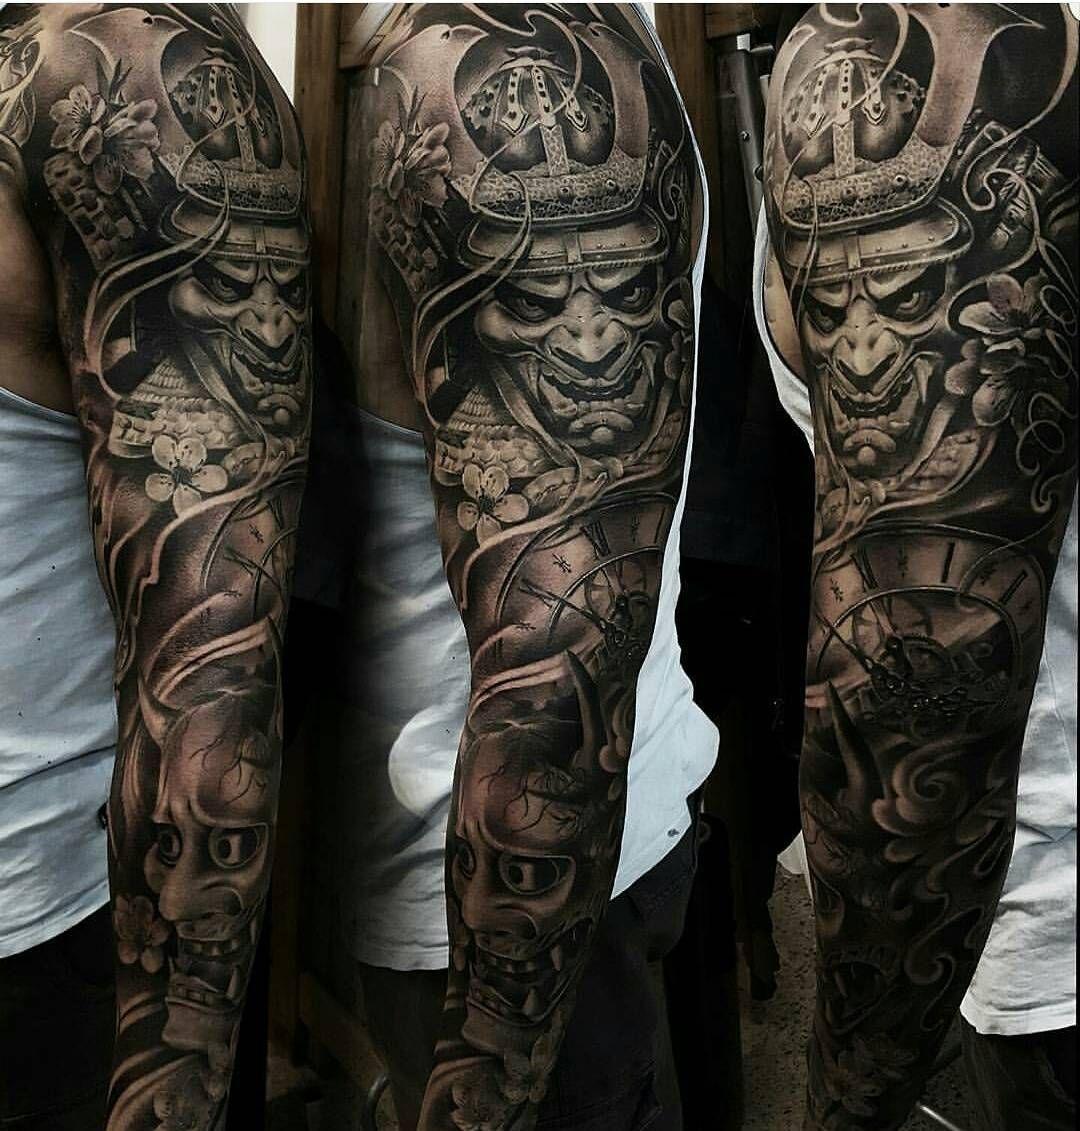 6 385 Likes 47 Comments Tattoo Realistic Tattoorealistic On Instagram By Yz Asencio Art Samurai Tattoo Sleeve Full Sleeve Tattoos Best Sleeve Tattoos